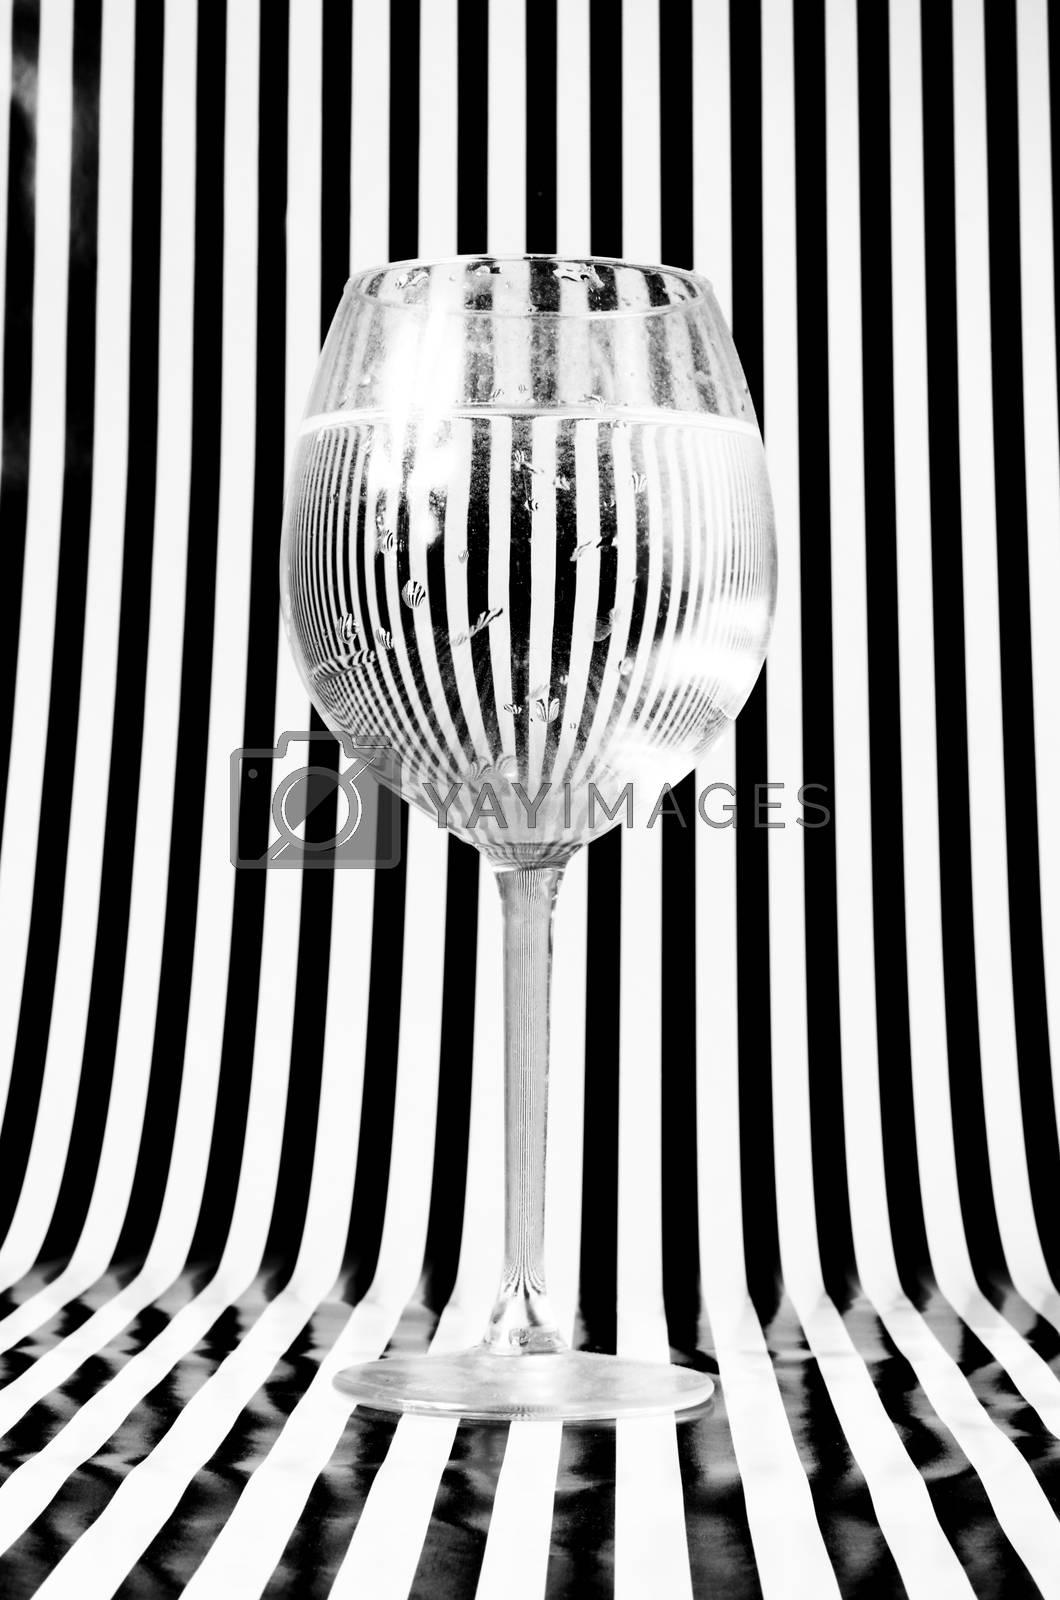 glass by sarkao